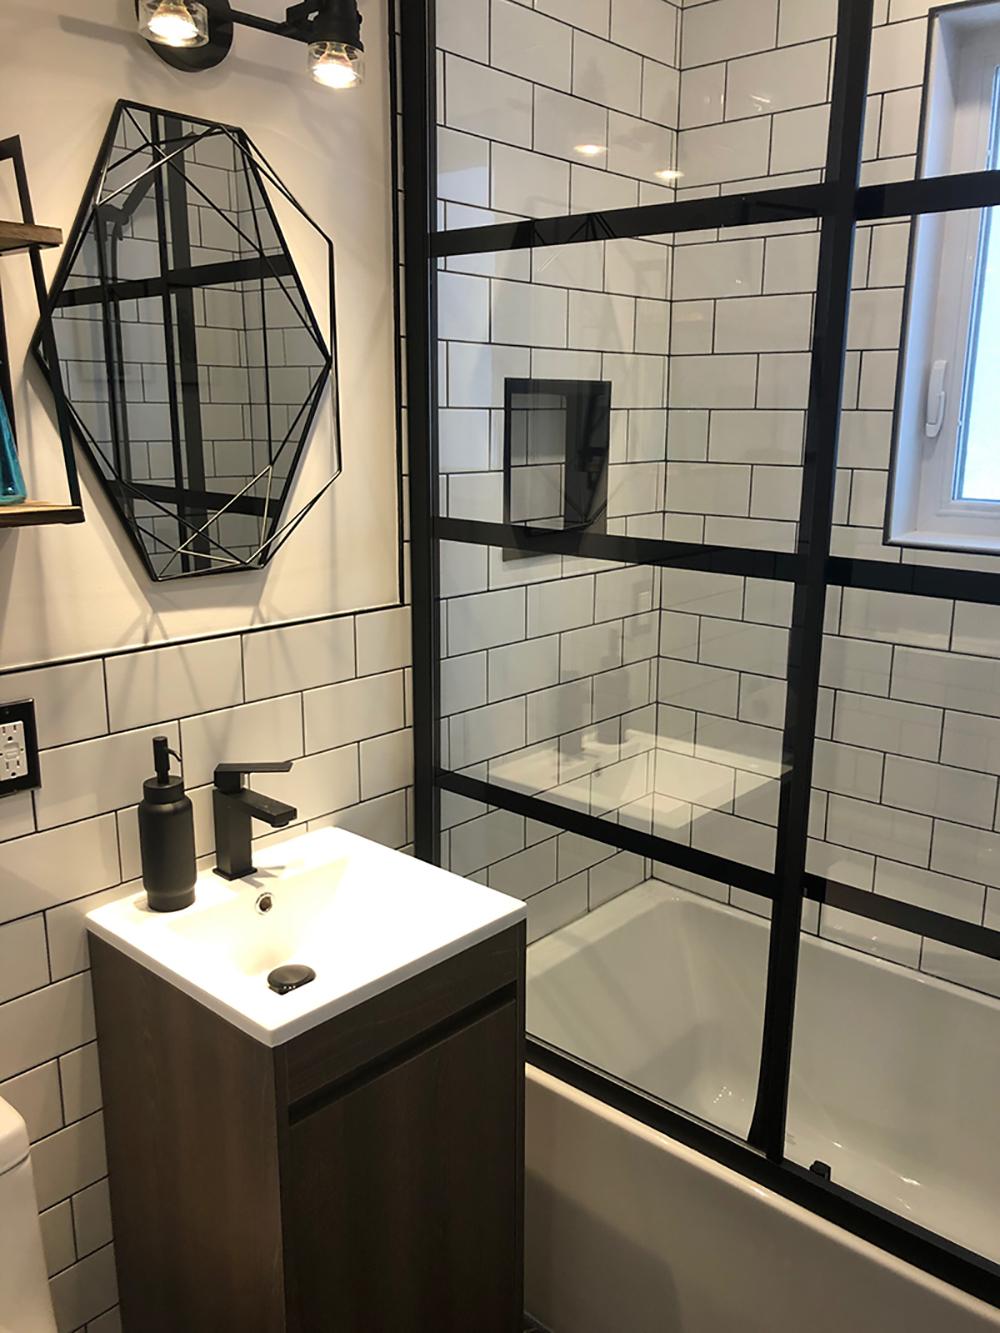 Fairhaven Bathroom Project